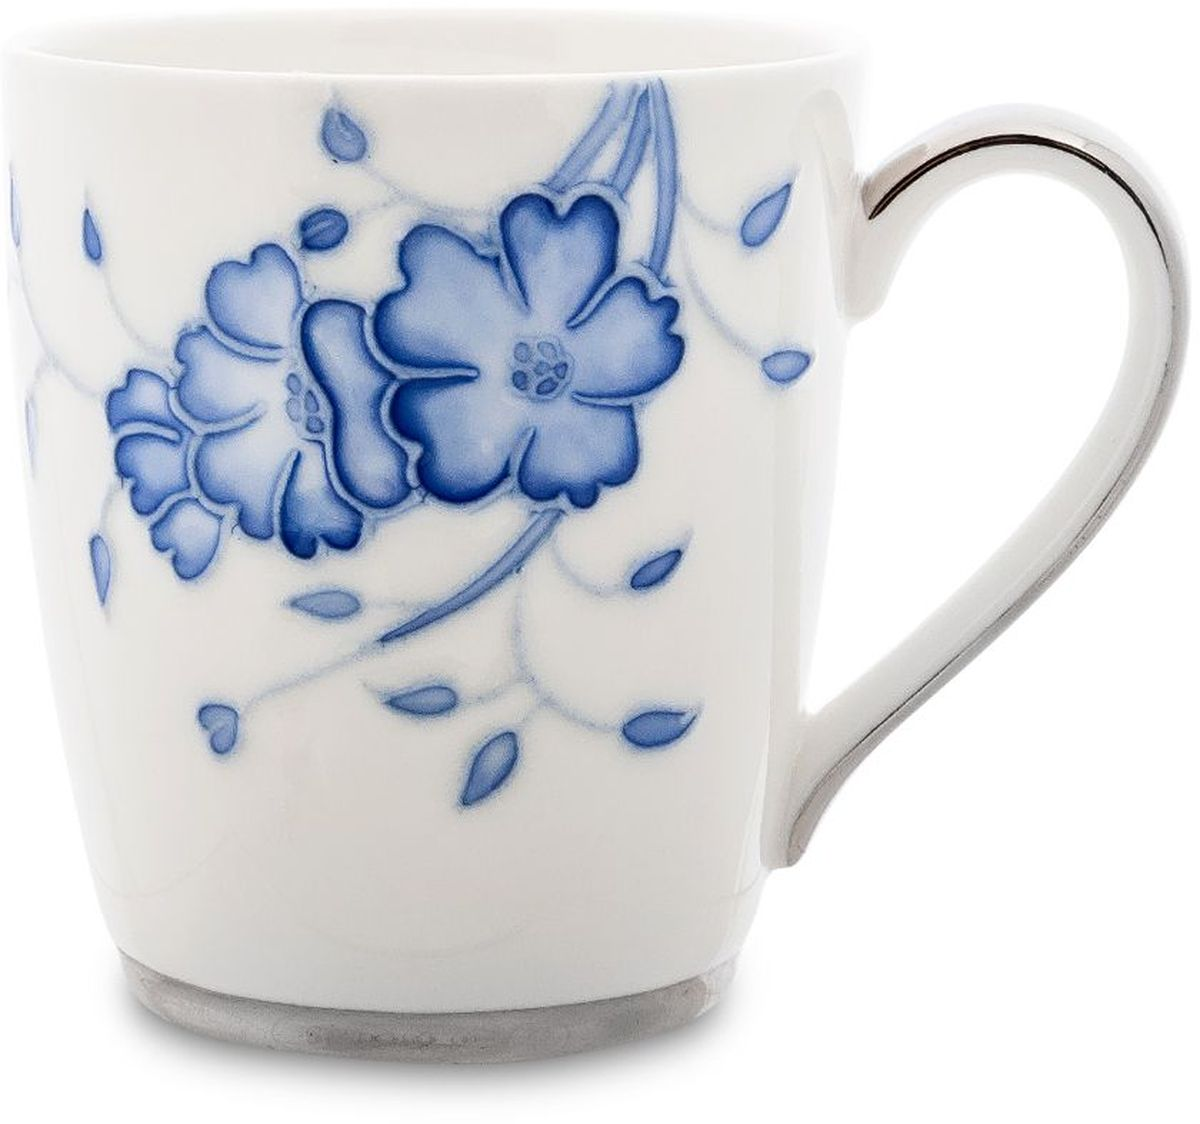 Кружка Pavone Голубая бабочка, 300 мл. 451605115510Высота: 9 см